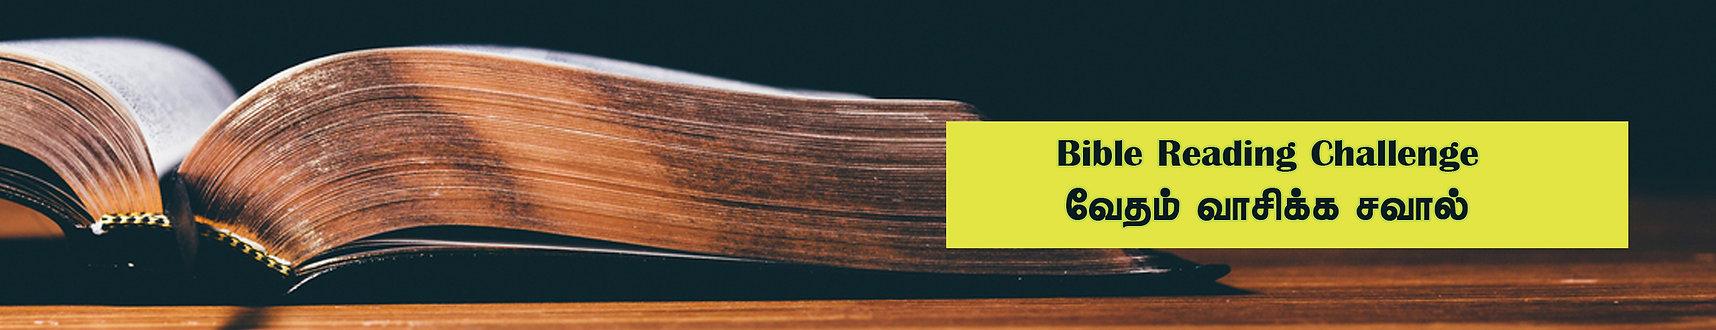 bible challenge.jpg